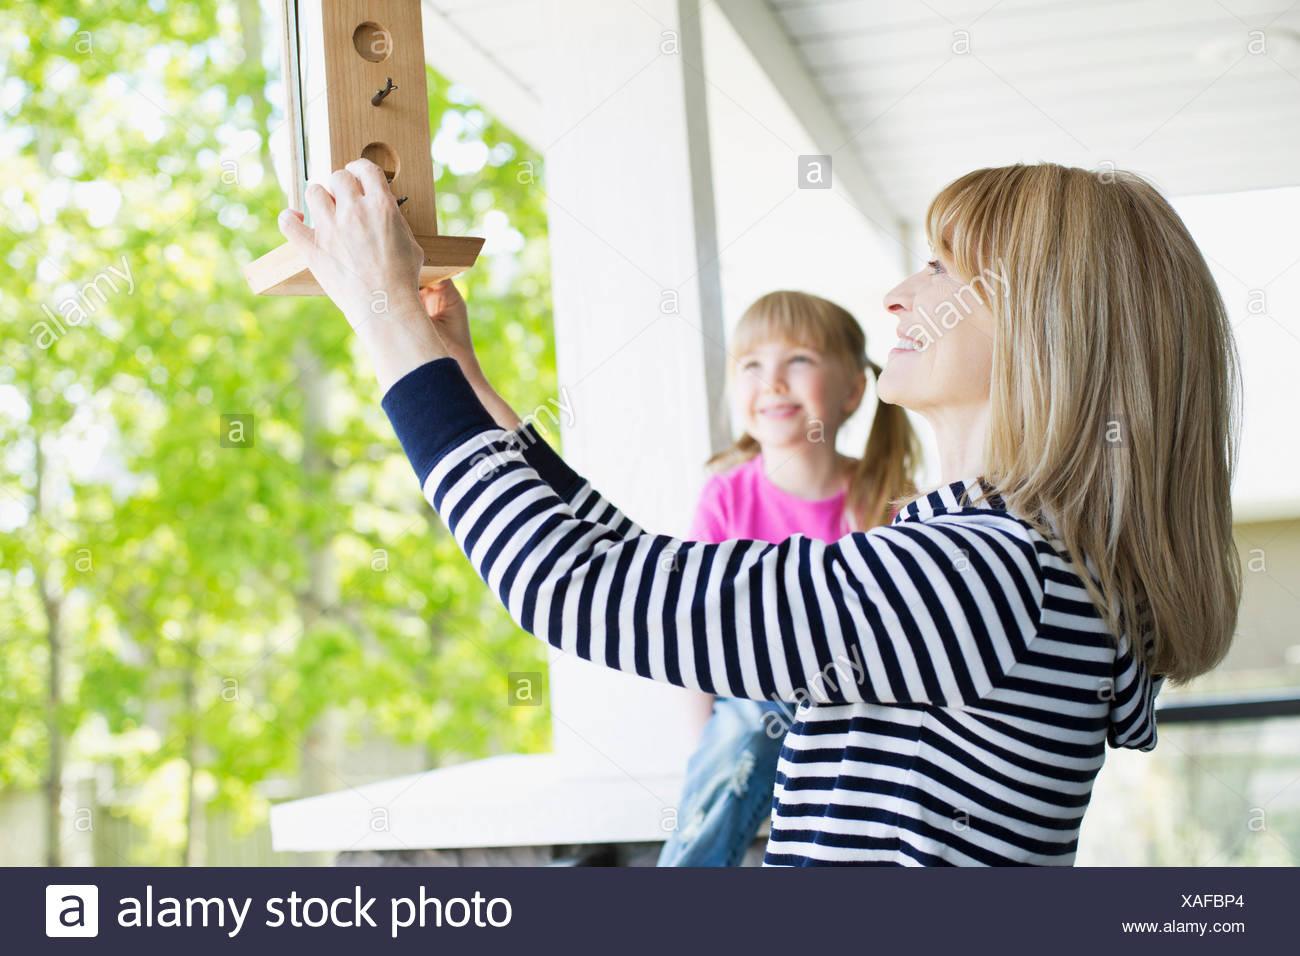 mature woman hanging bird feeder - Stock Image